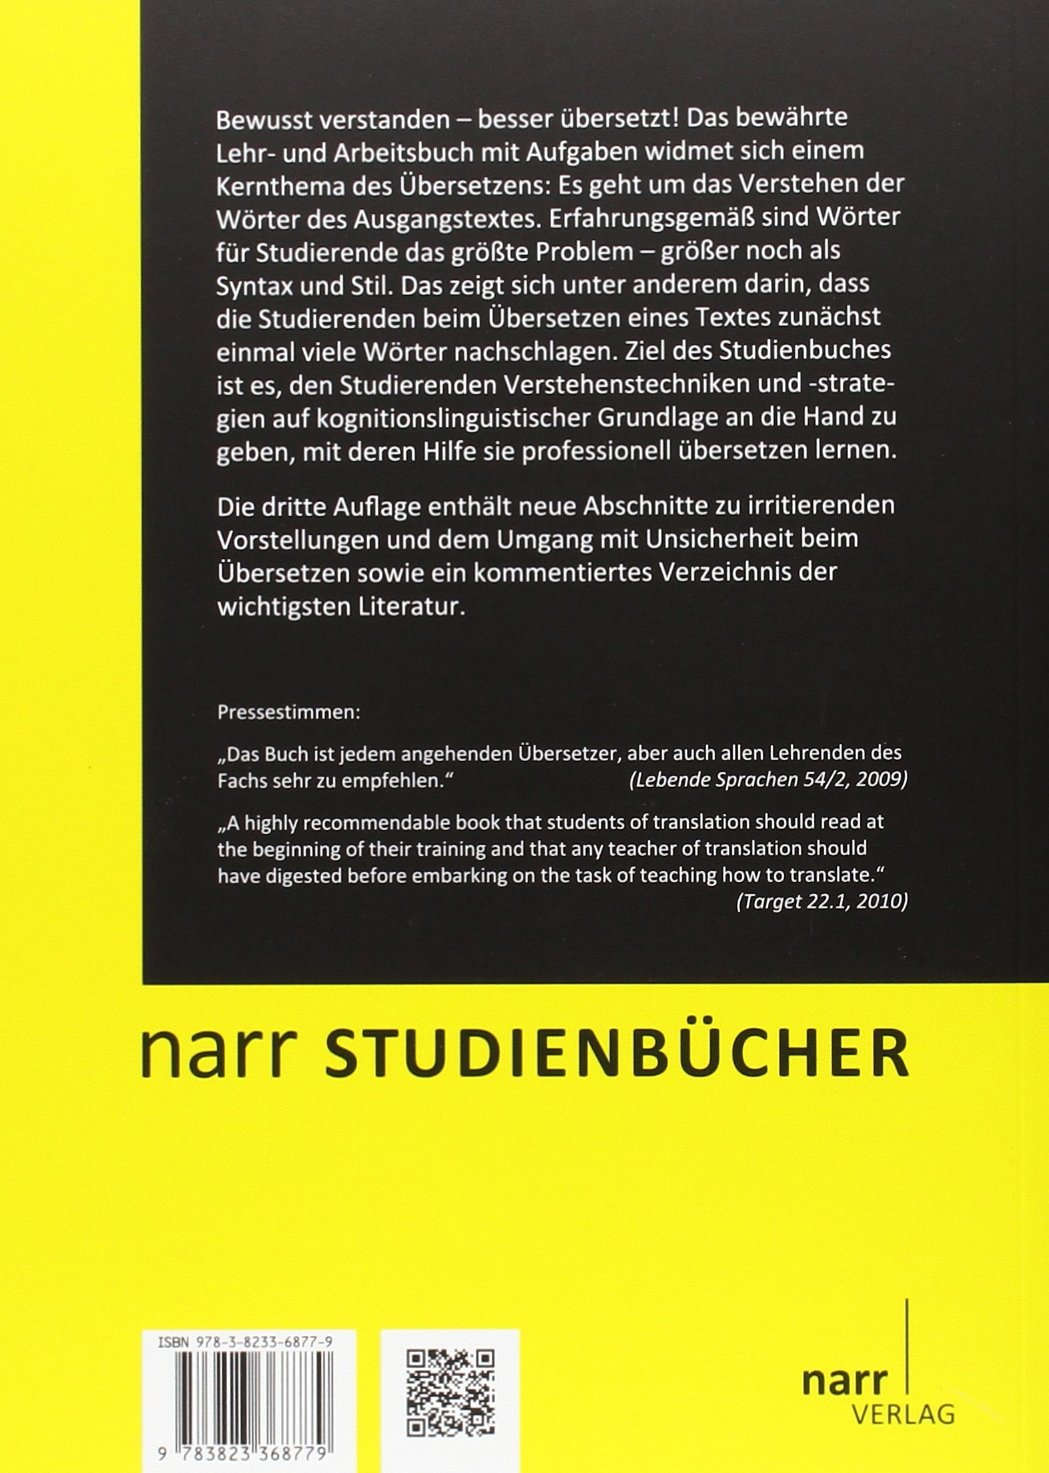 help you? beliebteste dating apps deutschland remarkable, rather valuable